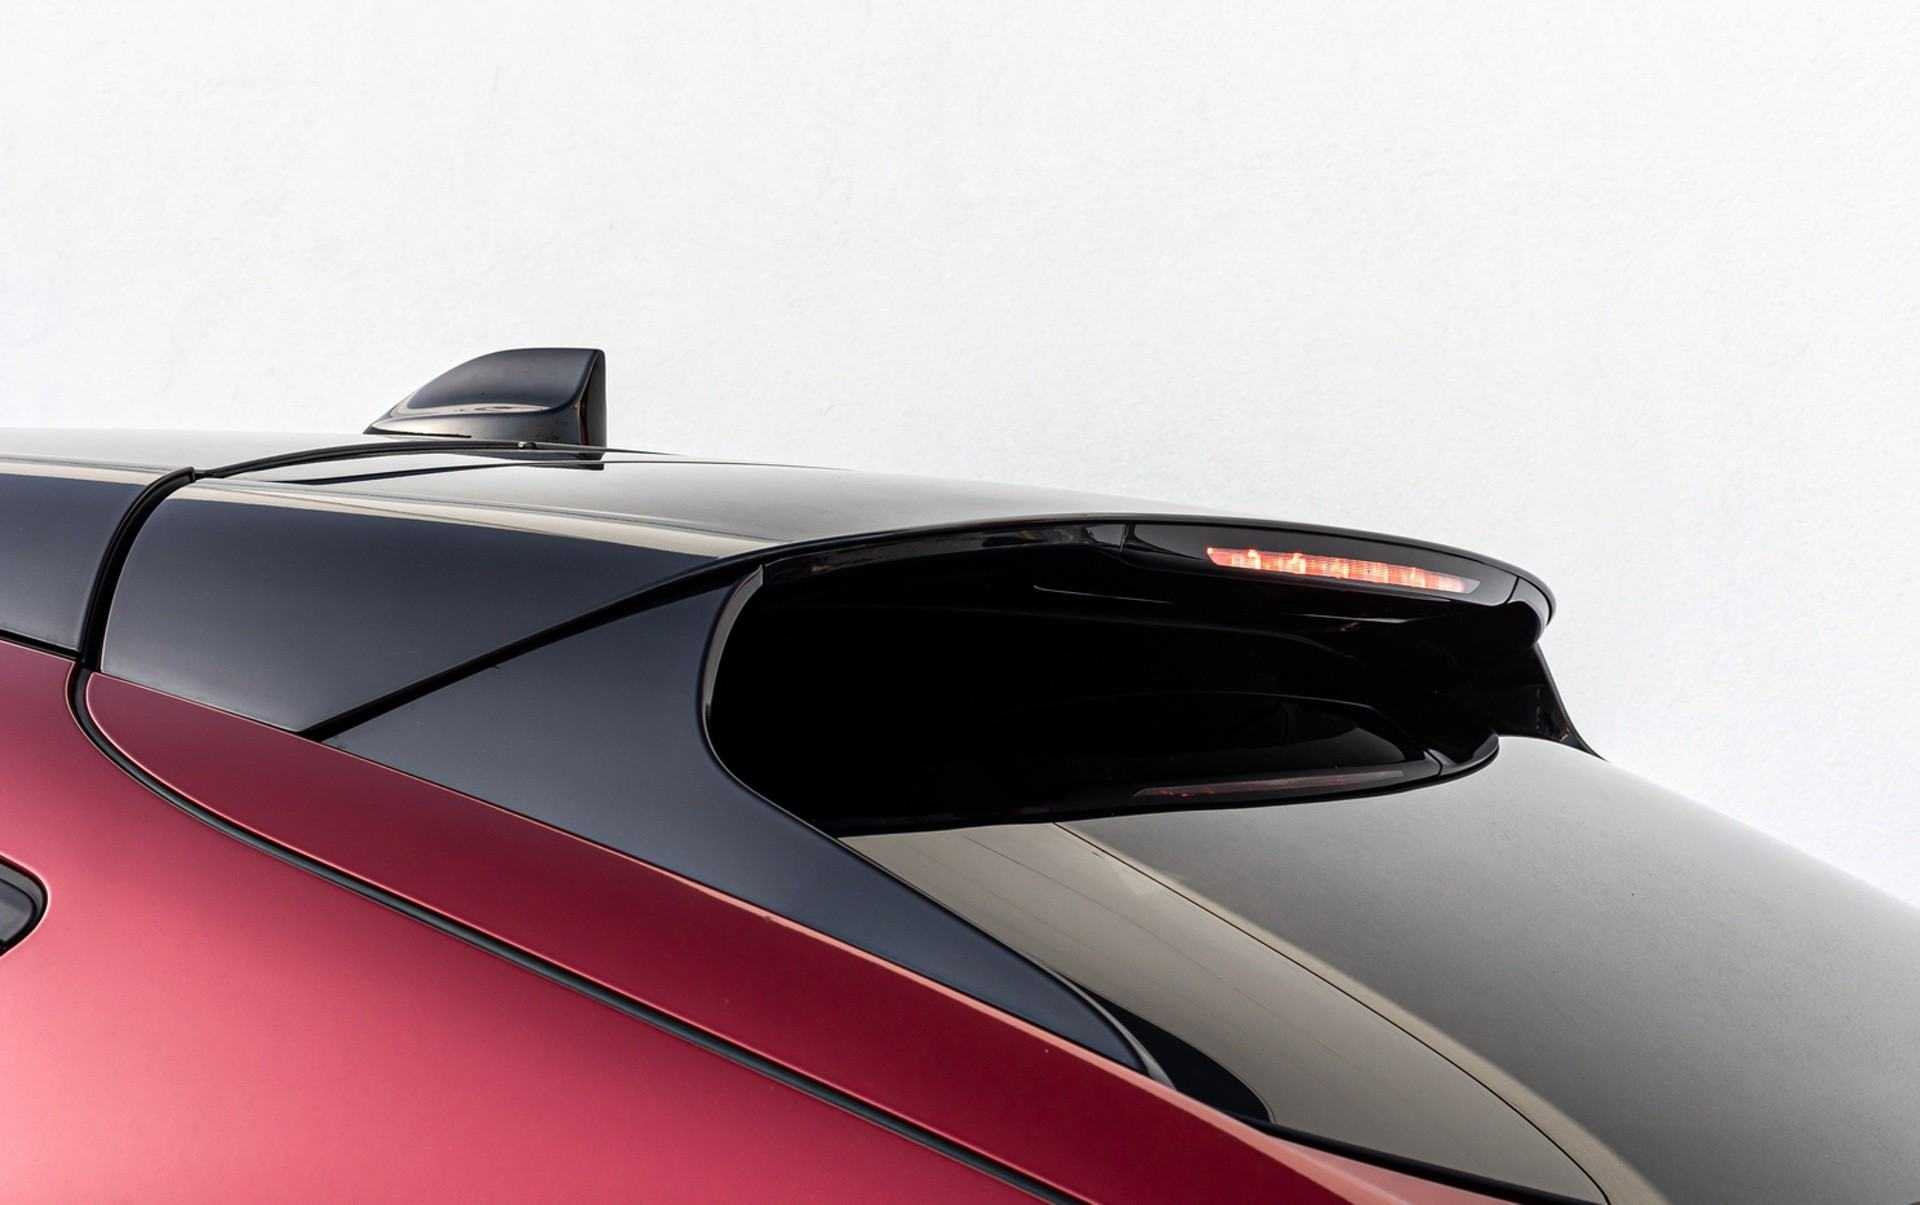 Ford_Mustang_Mach-E_greek_presskit-0169